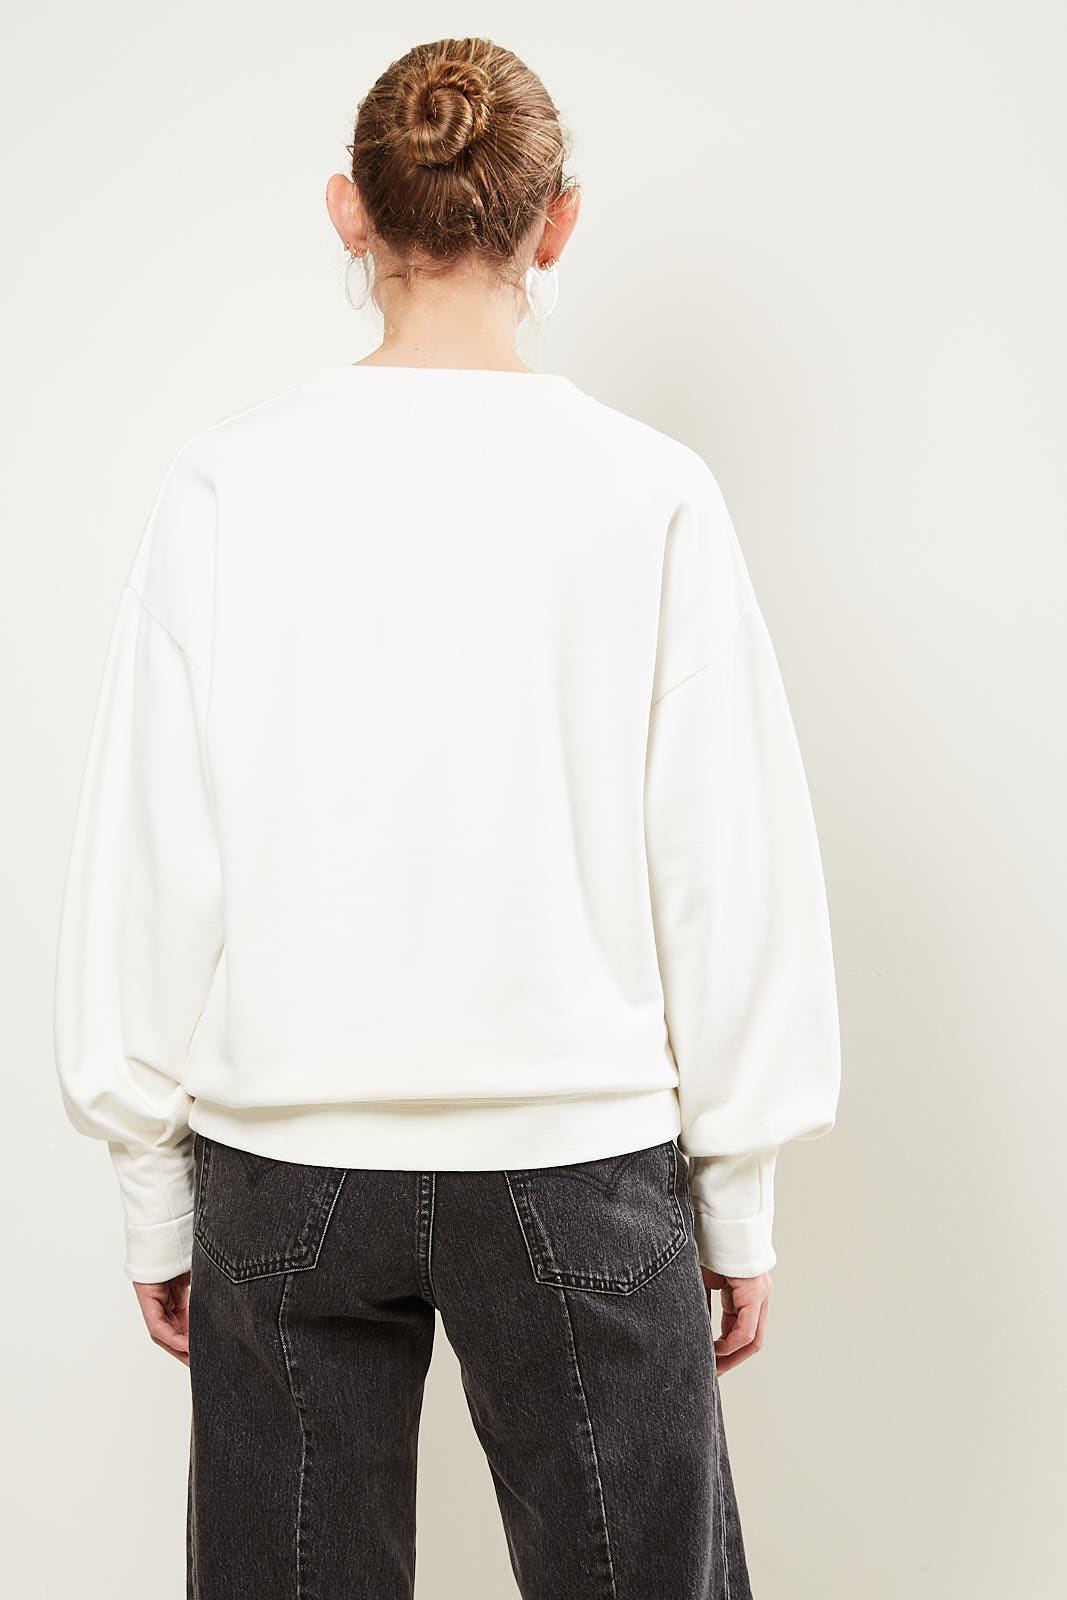 Humanoid - Bodyl benett sweater